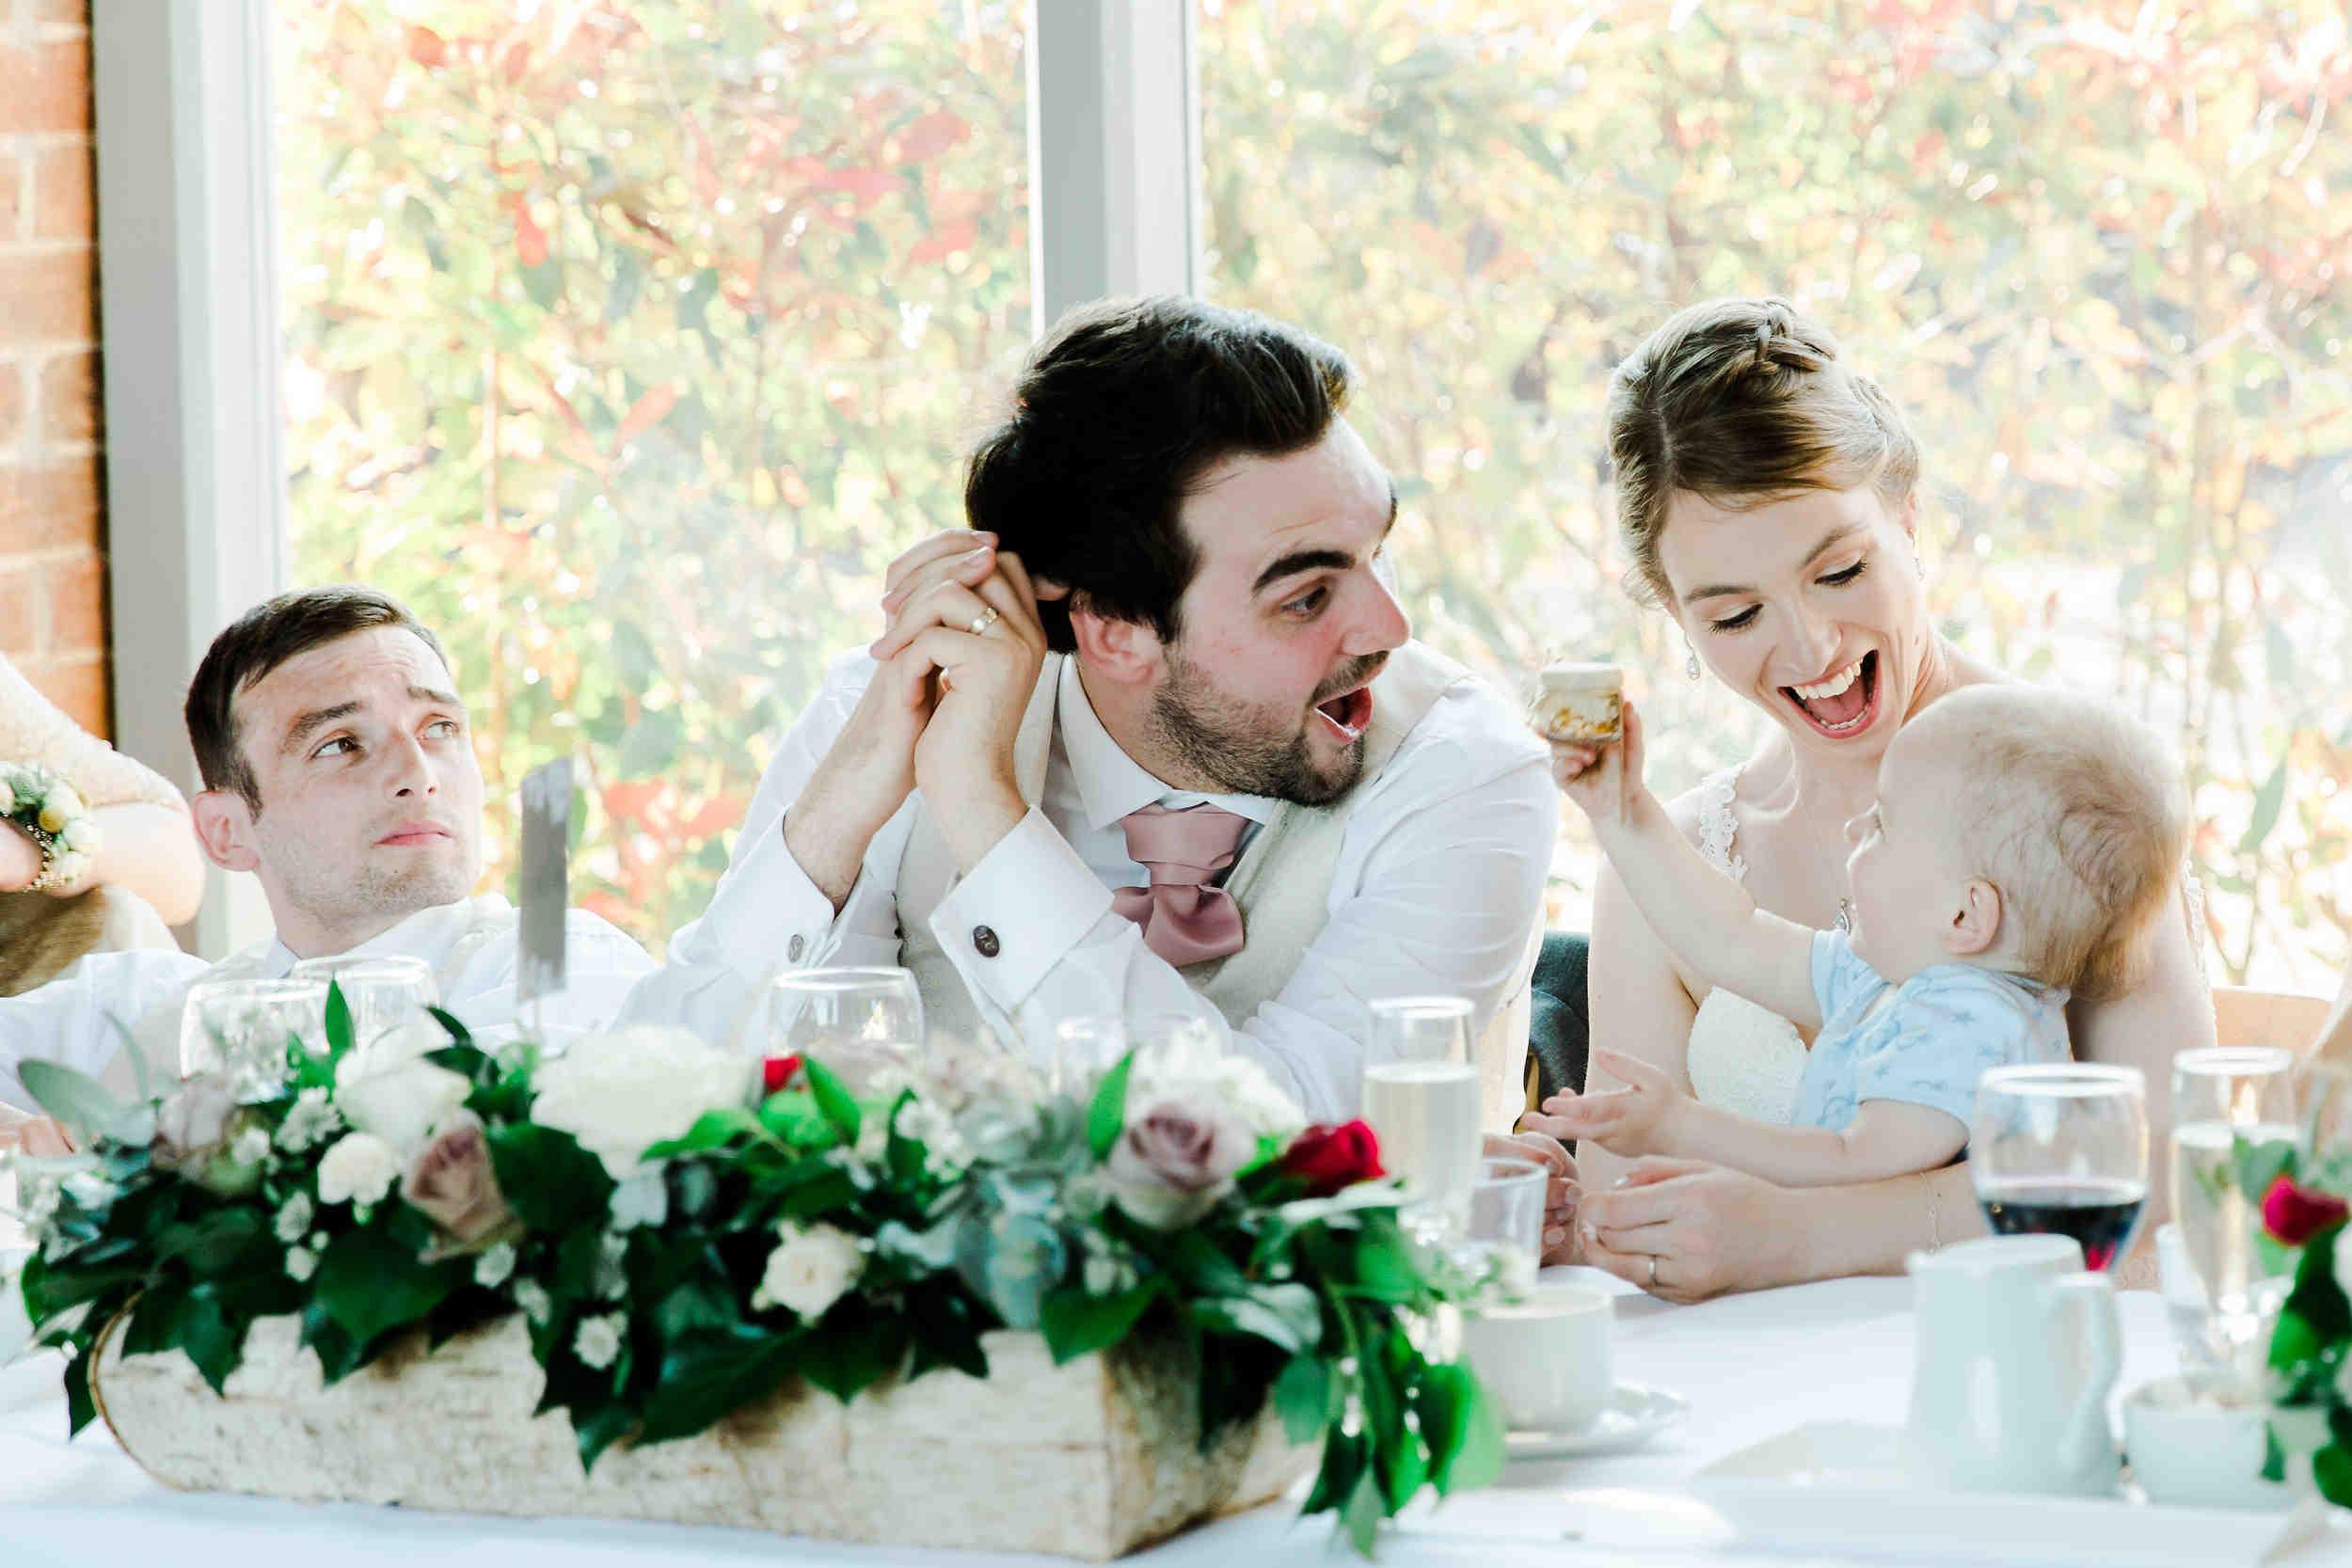 Modern_Stylish_Wedding_at_Swallows_Nest_Barn1245